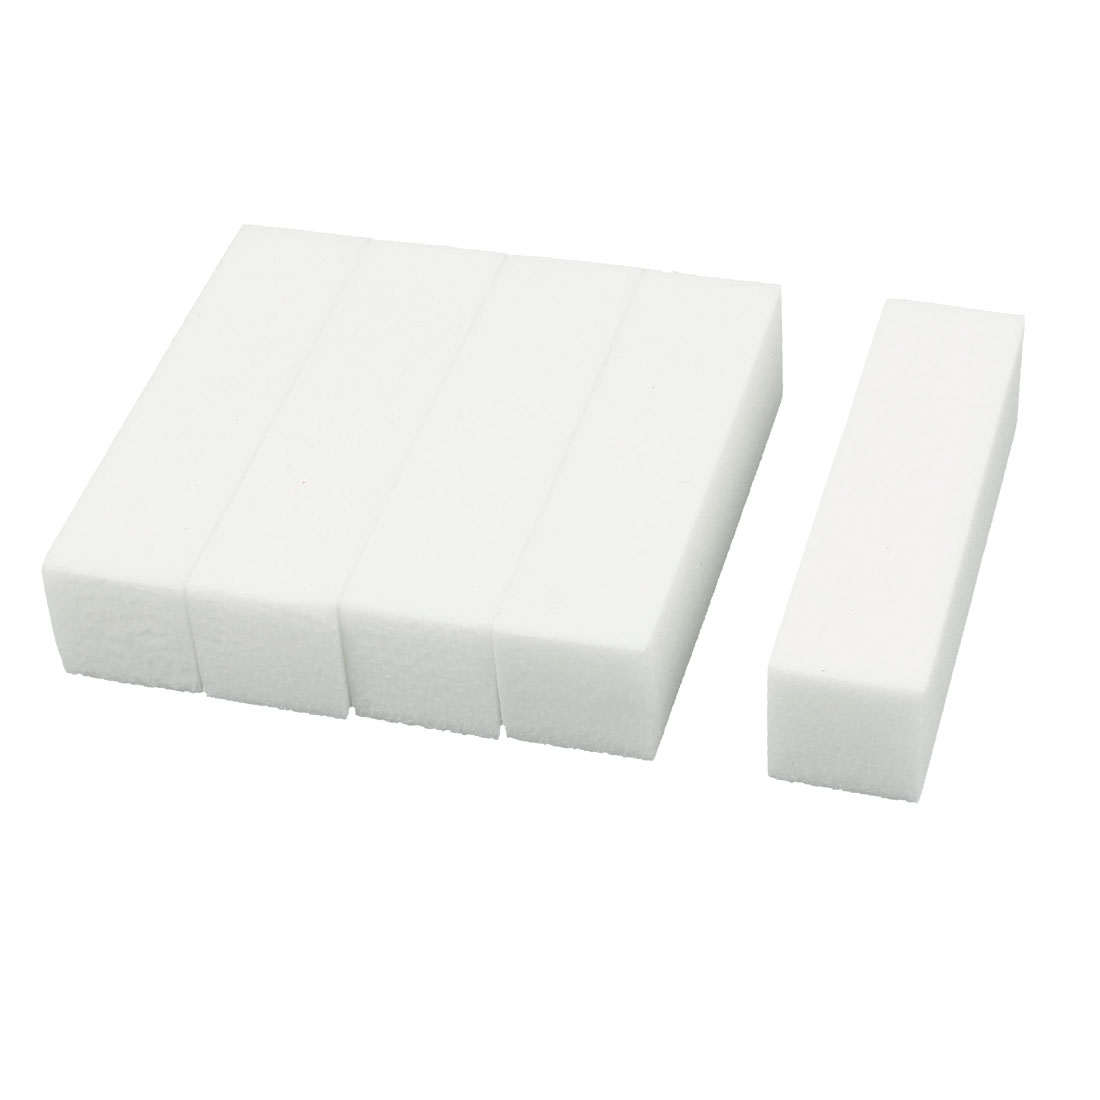 Tips Manicure Tool Nail Art Buffing Sanding Files Block Pedicure Care White 5pcs